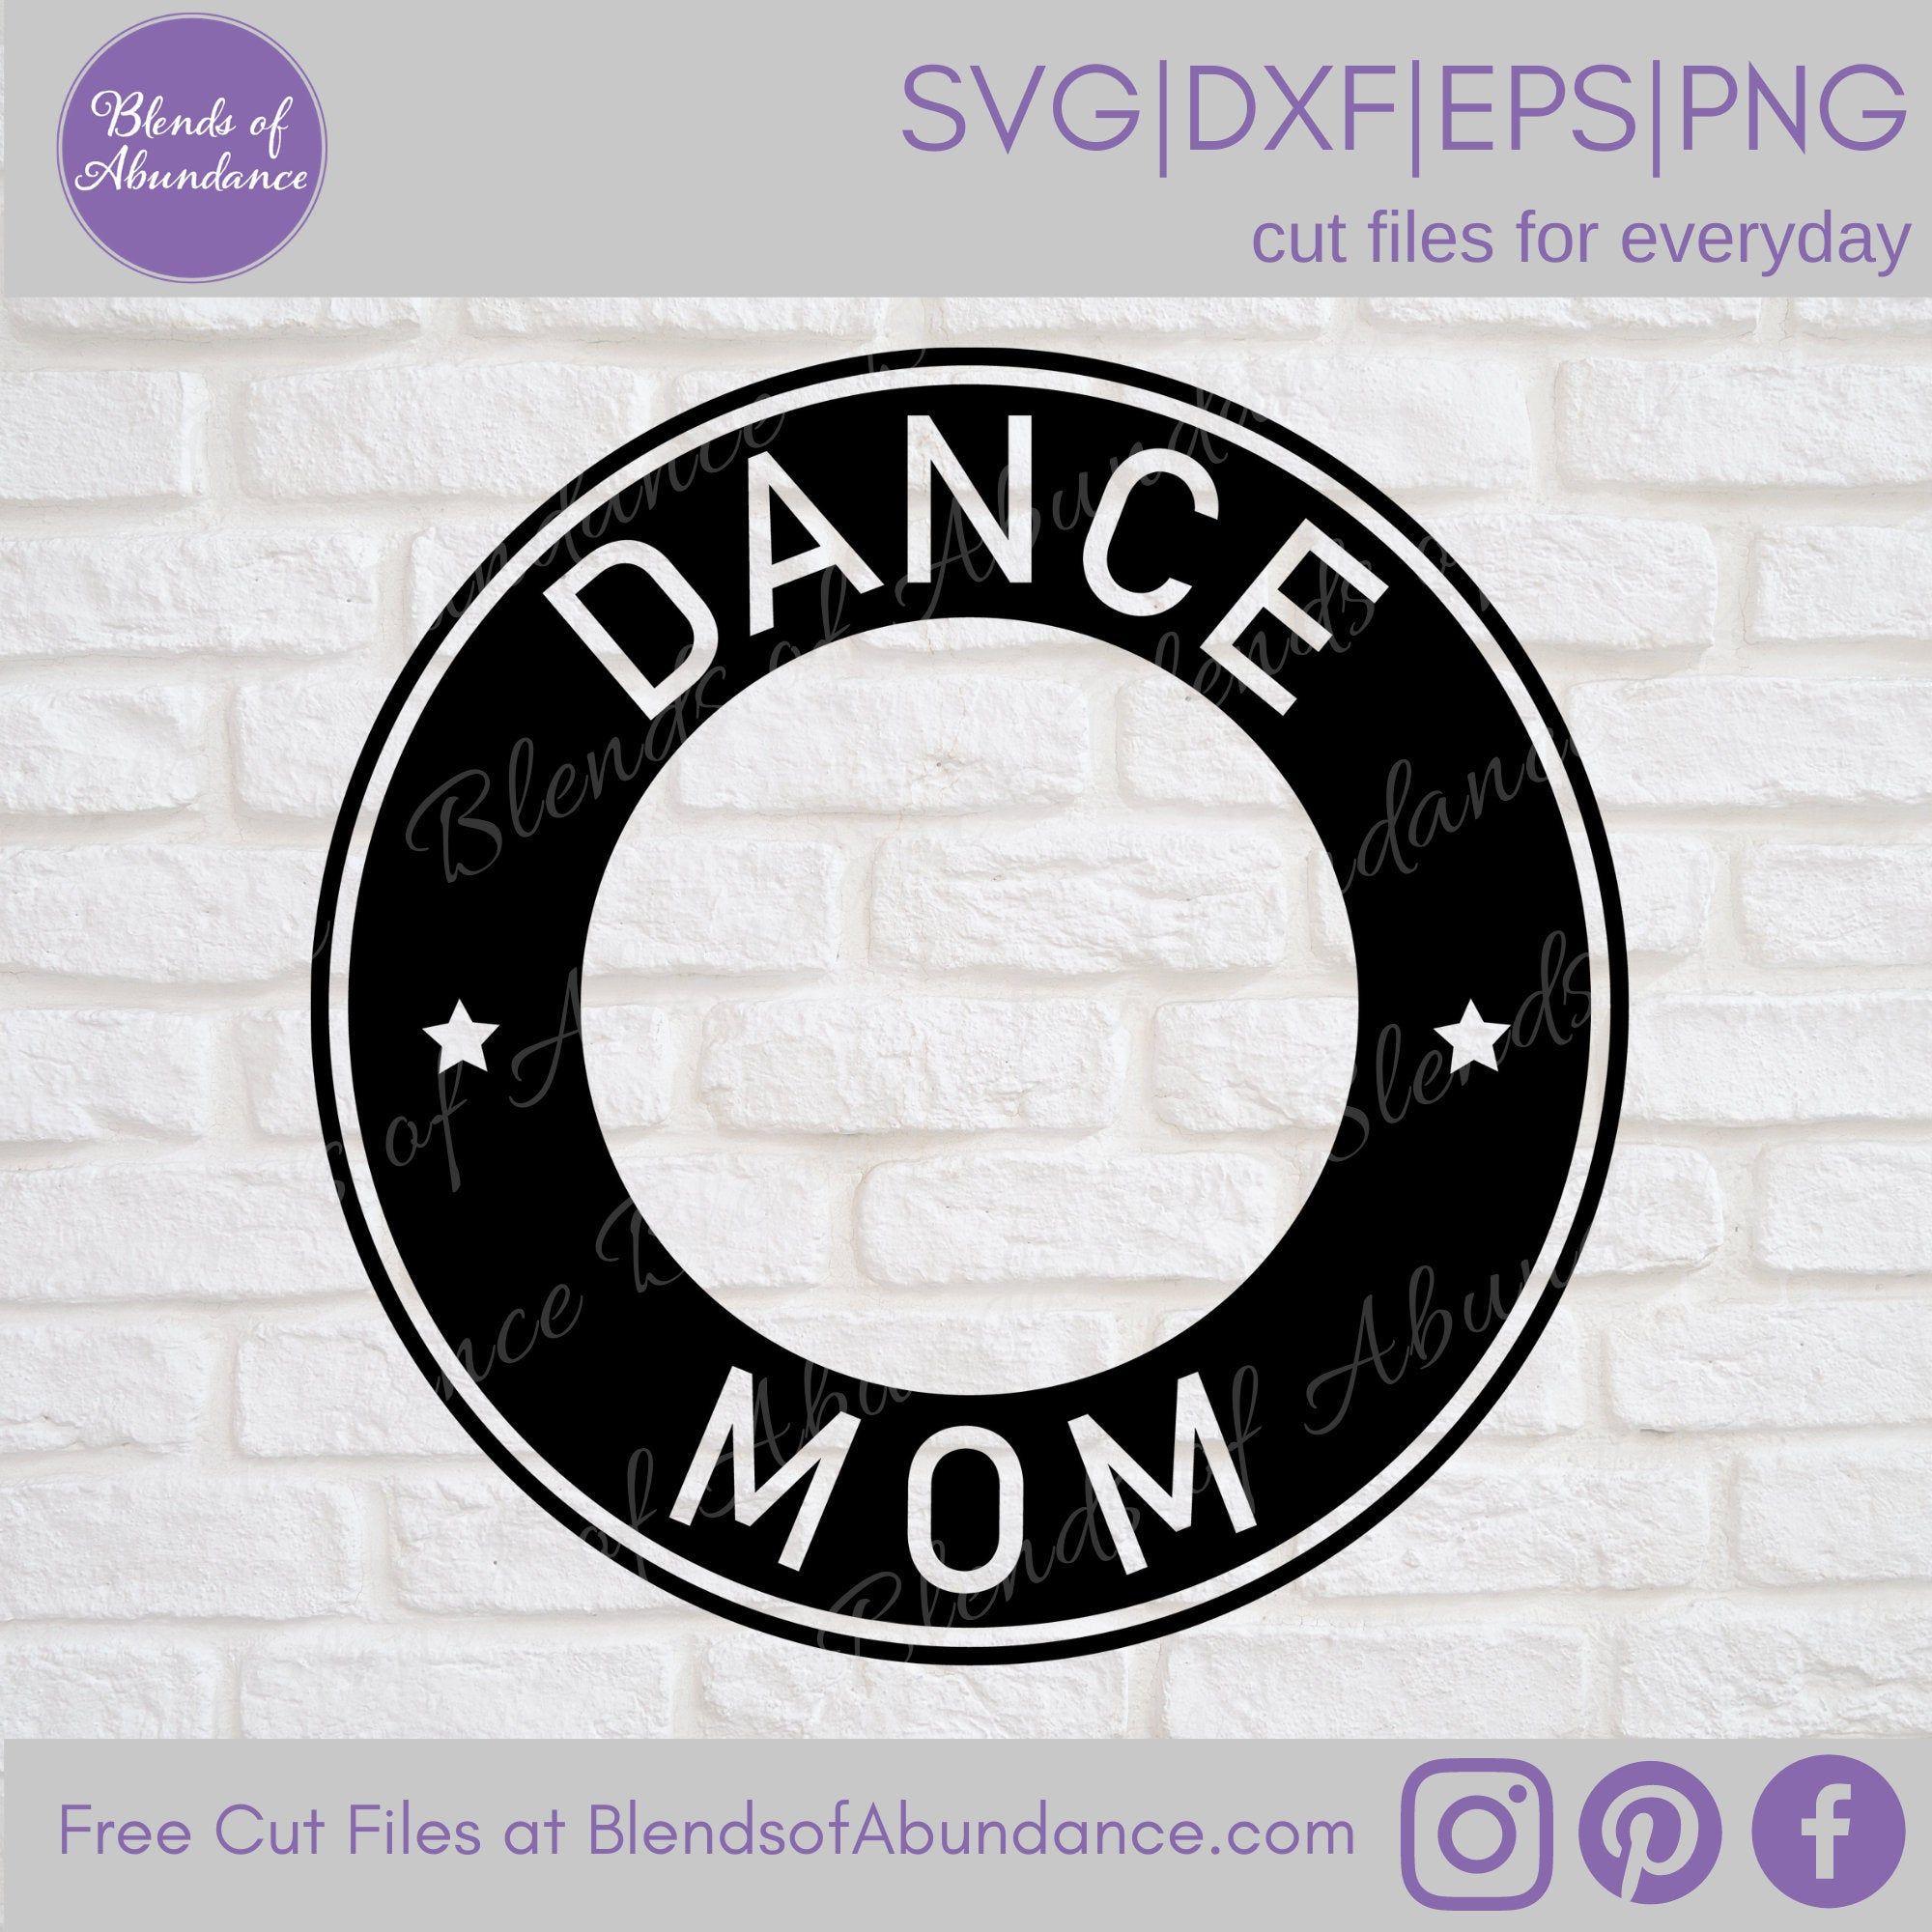 Dance Mom Label SVG Coffee Cup Label SVG Starbucks Cup